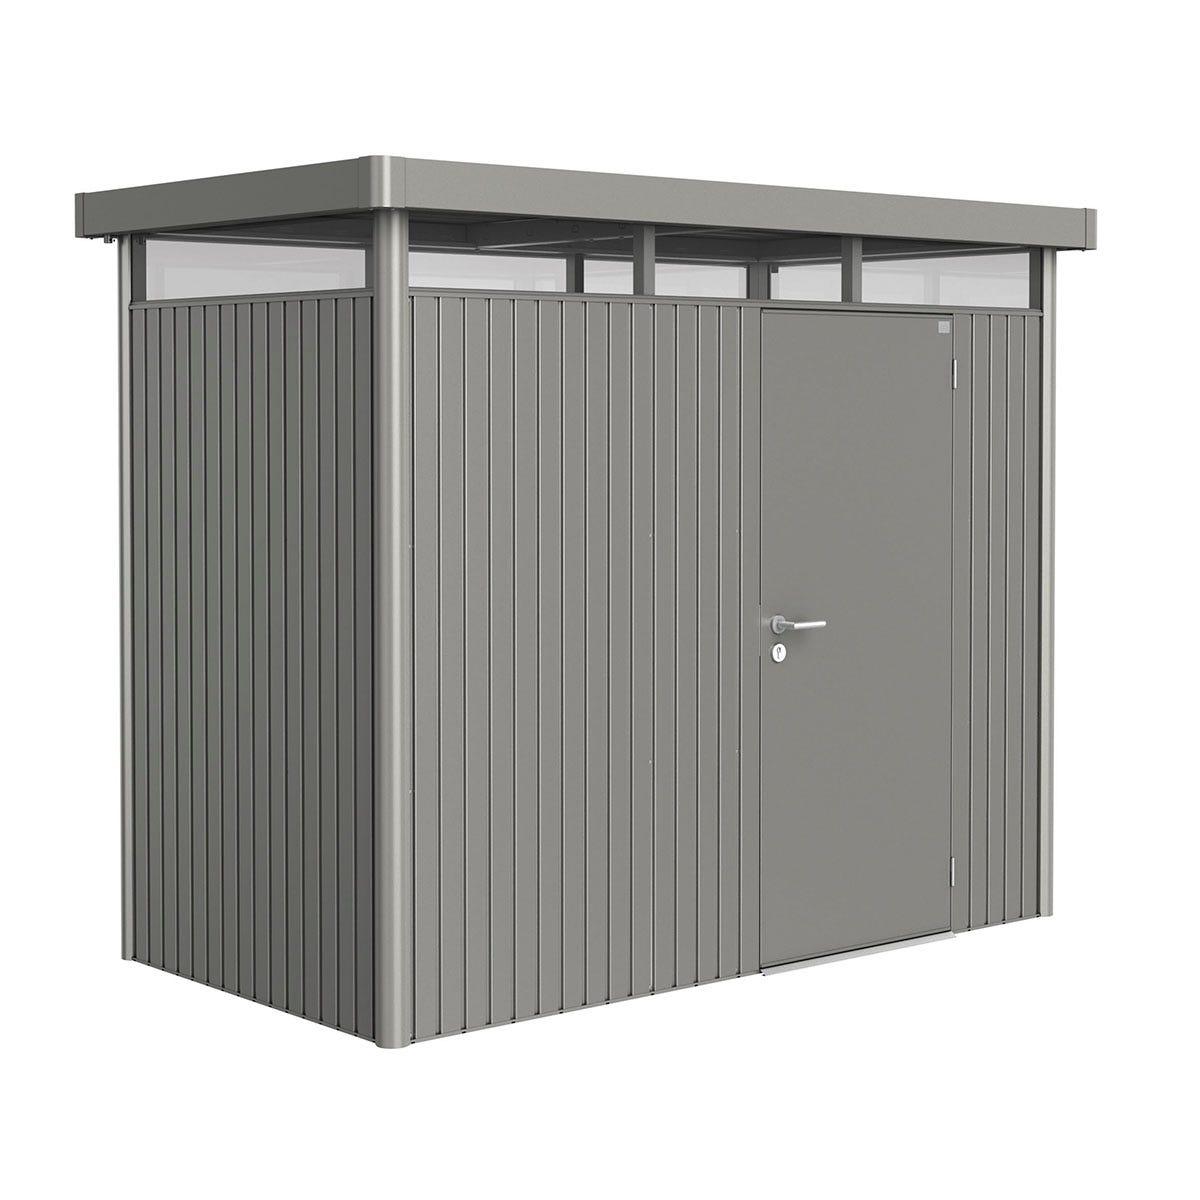 Biohort Highline Metal Shed H1 Standard door 9 x 5 - Quartz Grey